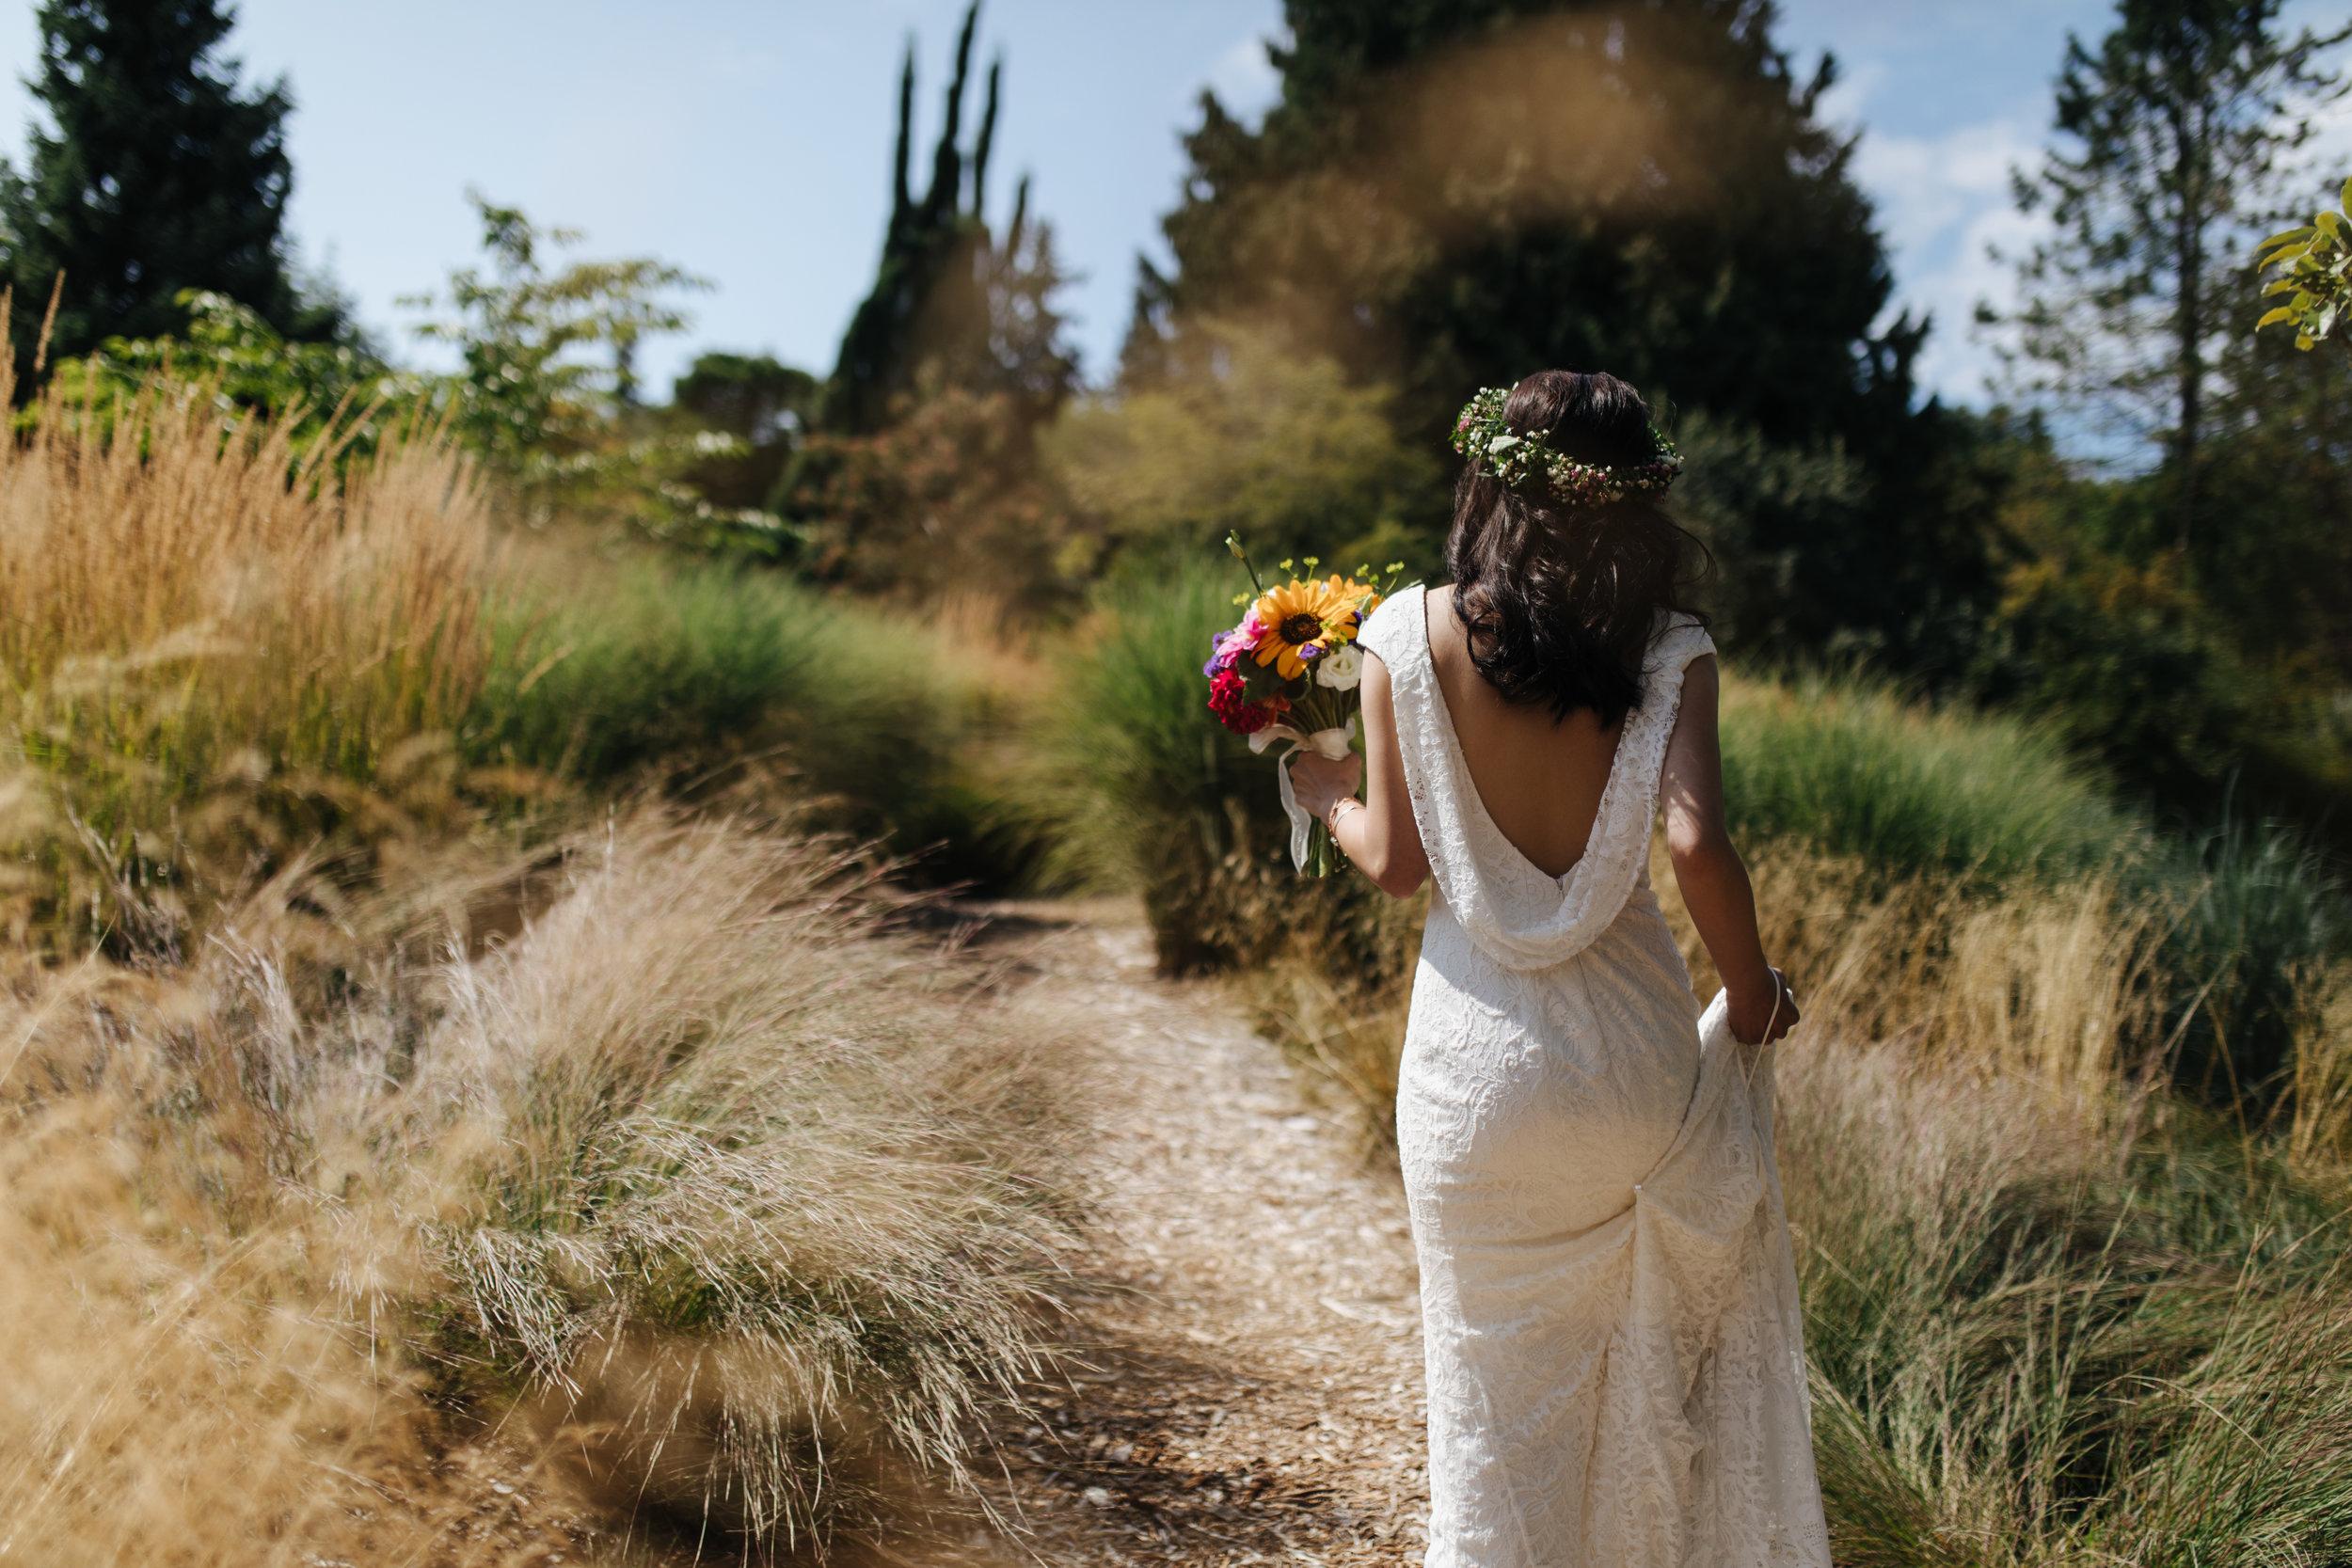 herastudios_wedding_bella_james_hera_selects-28.jpg